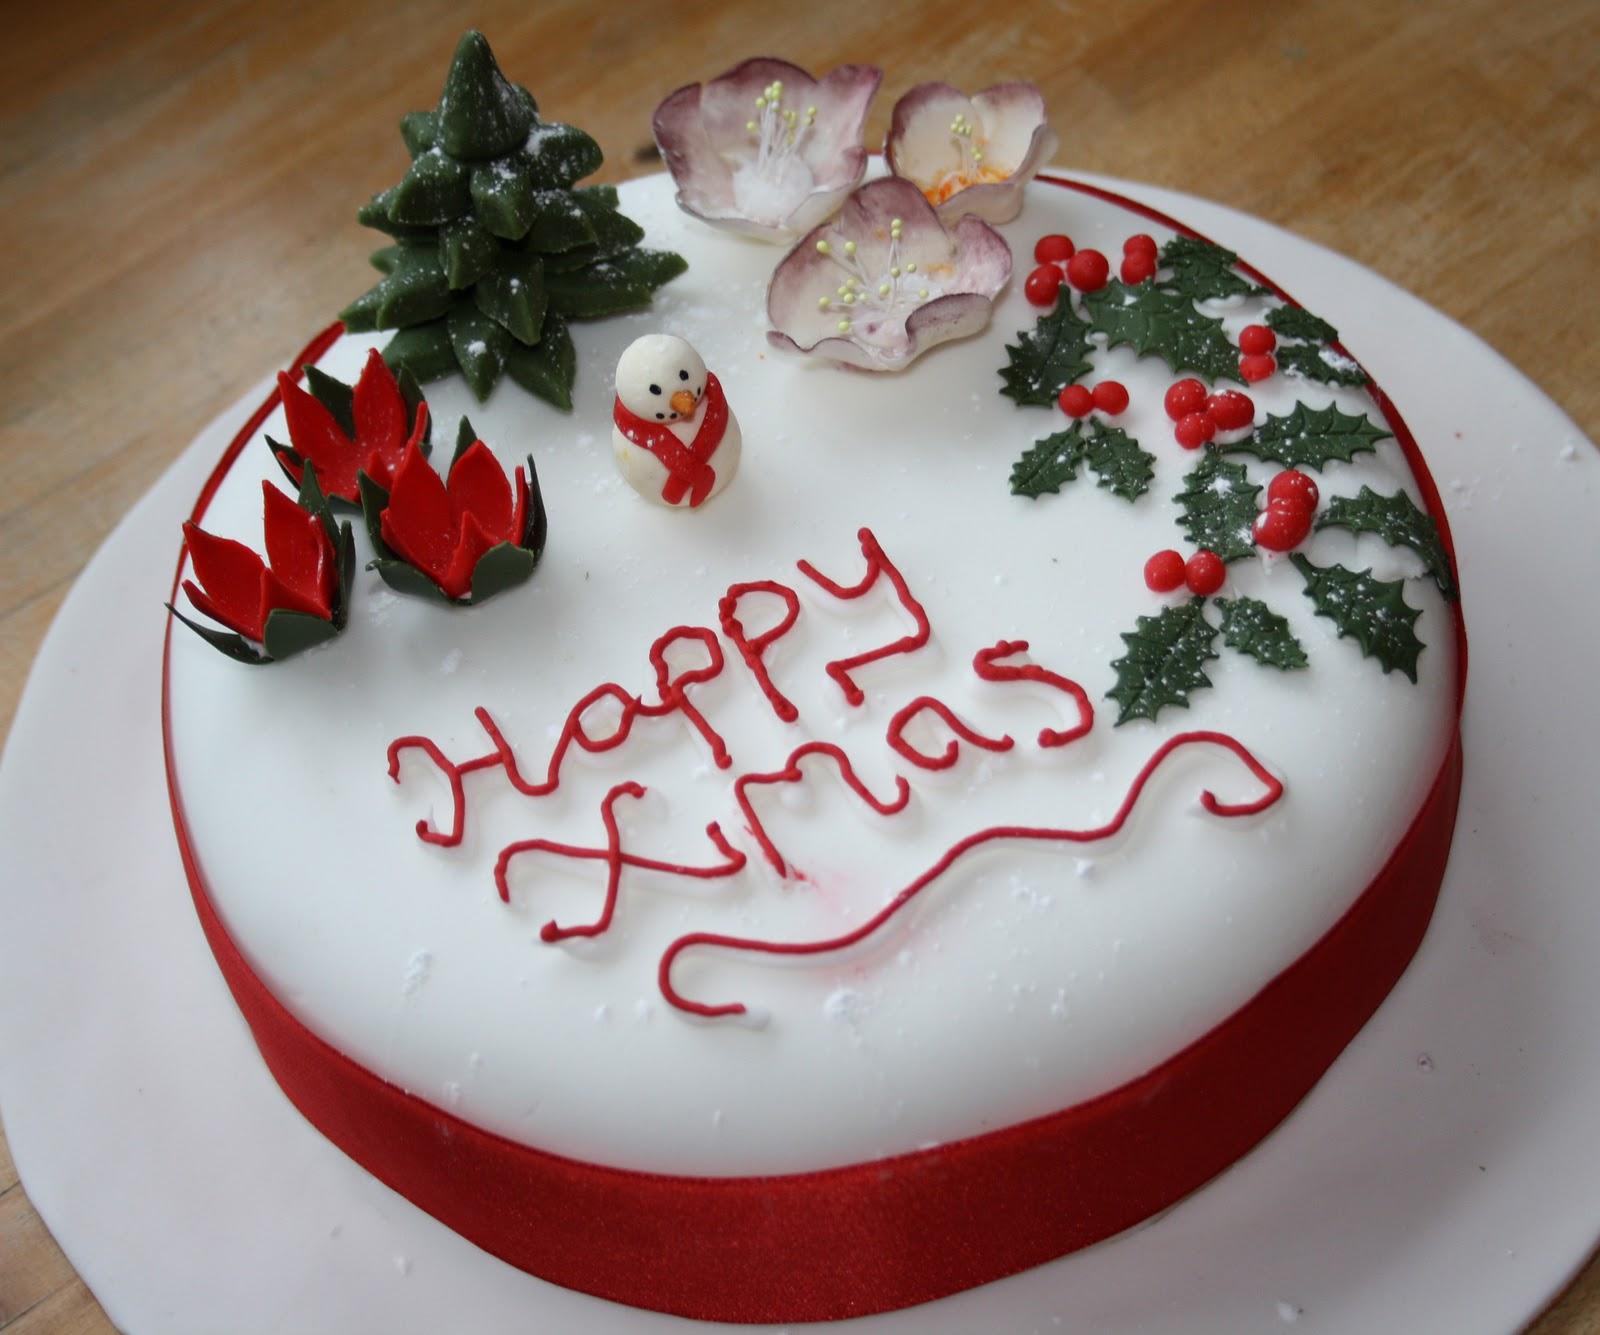 Christmas Cake Decorations Flowers: Decorating The Christmas Cake